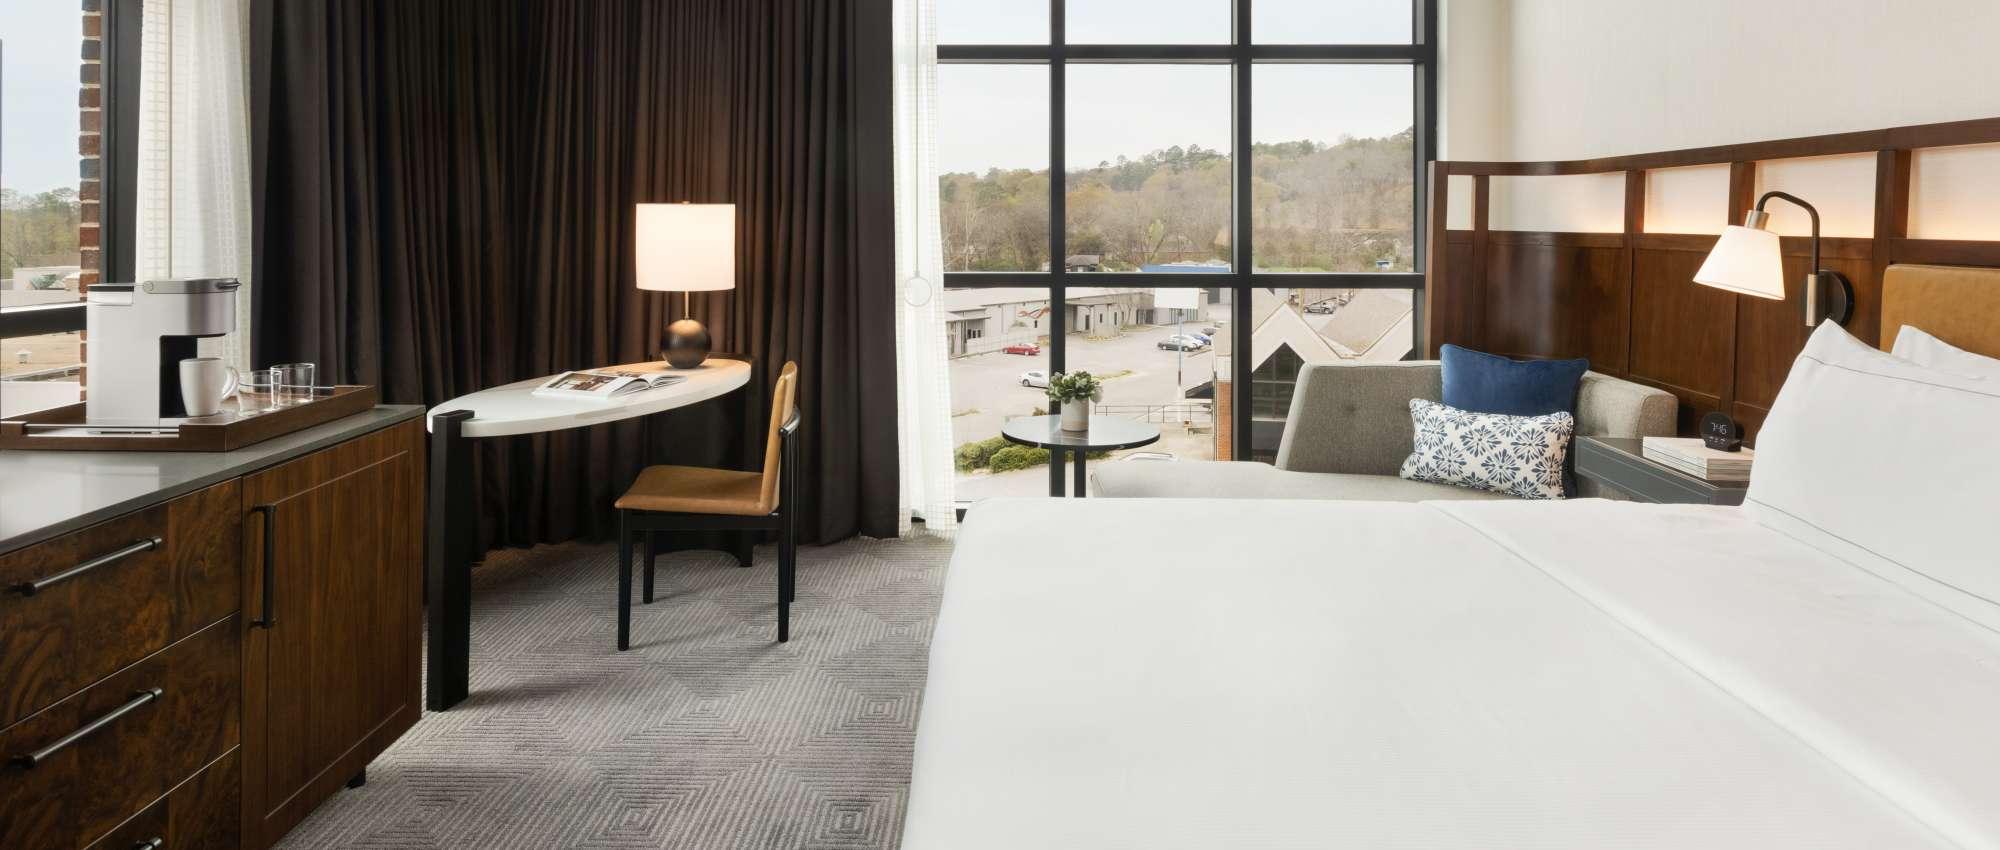 Guestroom at Valley Hotel Homewood Birmingham